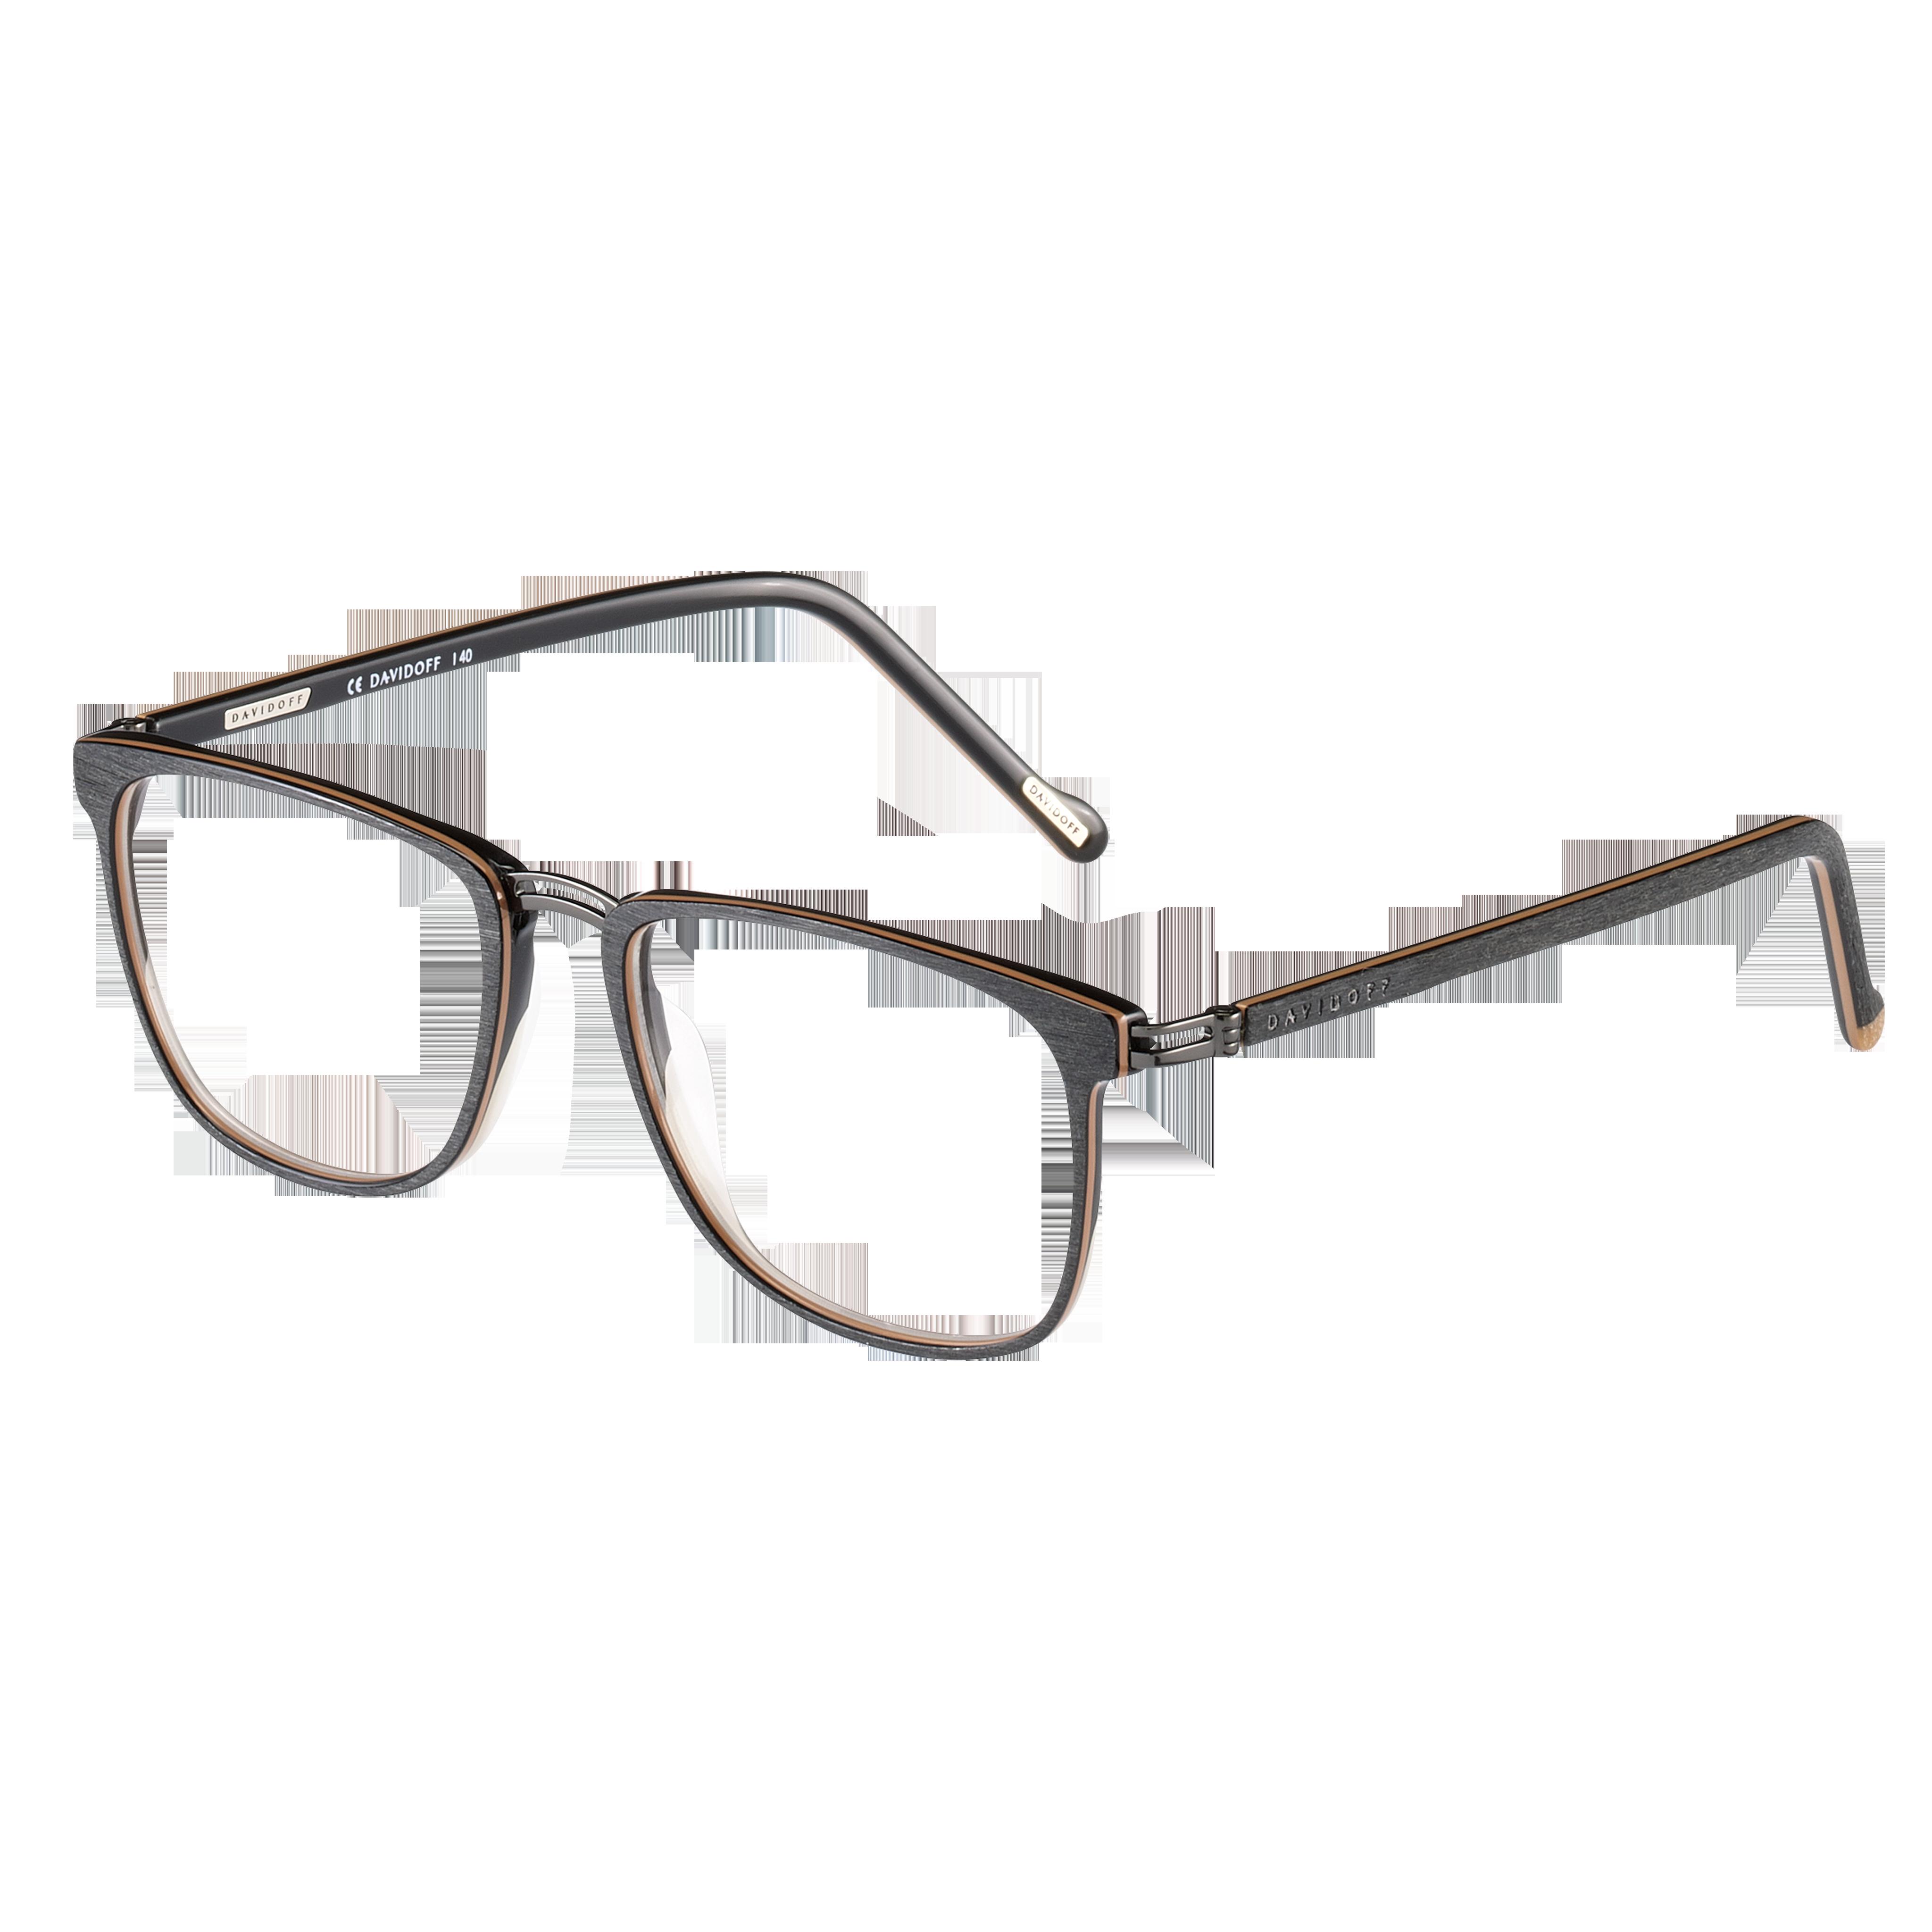 d93406cfc8b3 Eyewear | DAVIDOFF